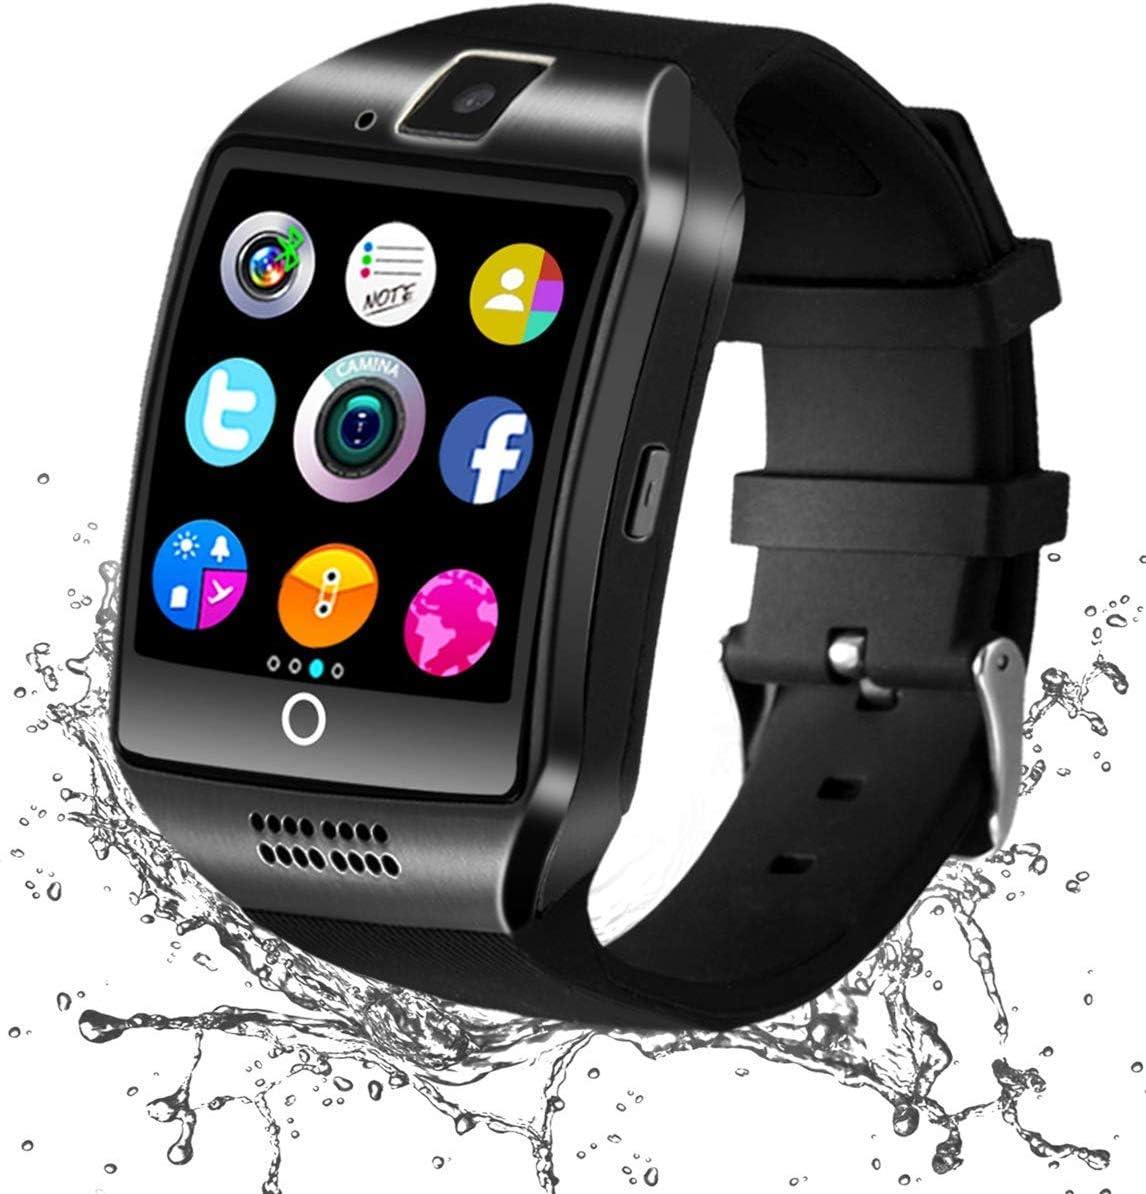 Reloj Inteligente Bluetooth, Smartwatch con Camara Impermeable Smart Watch SIM/TF Ranura Whatsapp Sports Podómetro Pantalla Táctil Reloj Bracelet para Android Teléfono Hombre Mujer Niño Niña: Amazon.es: Electrónica